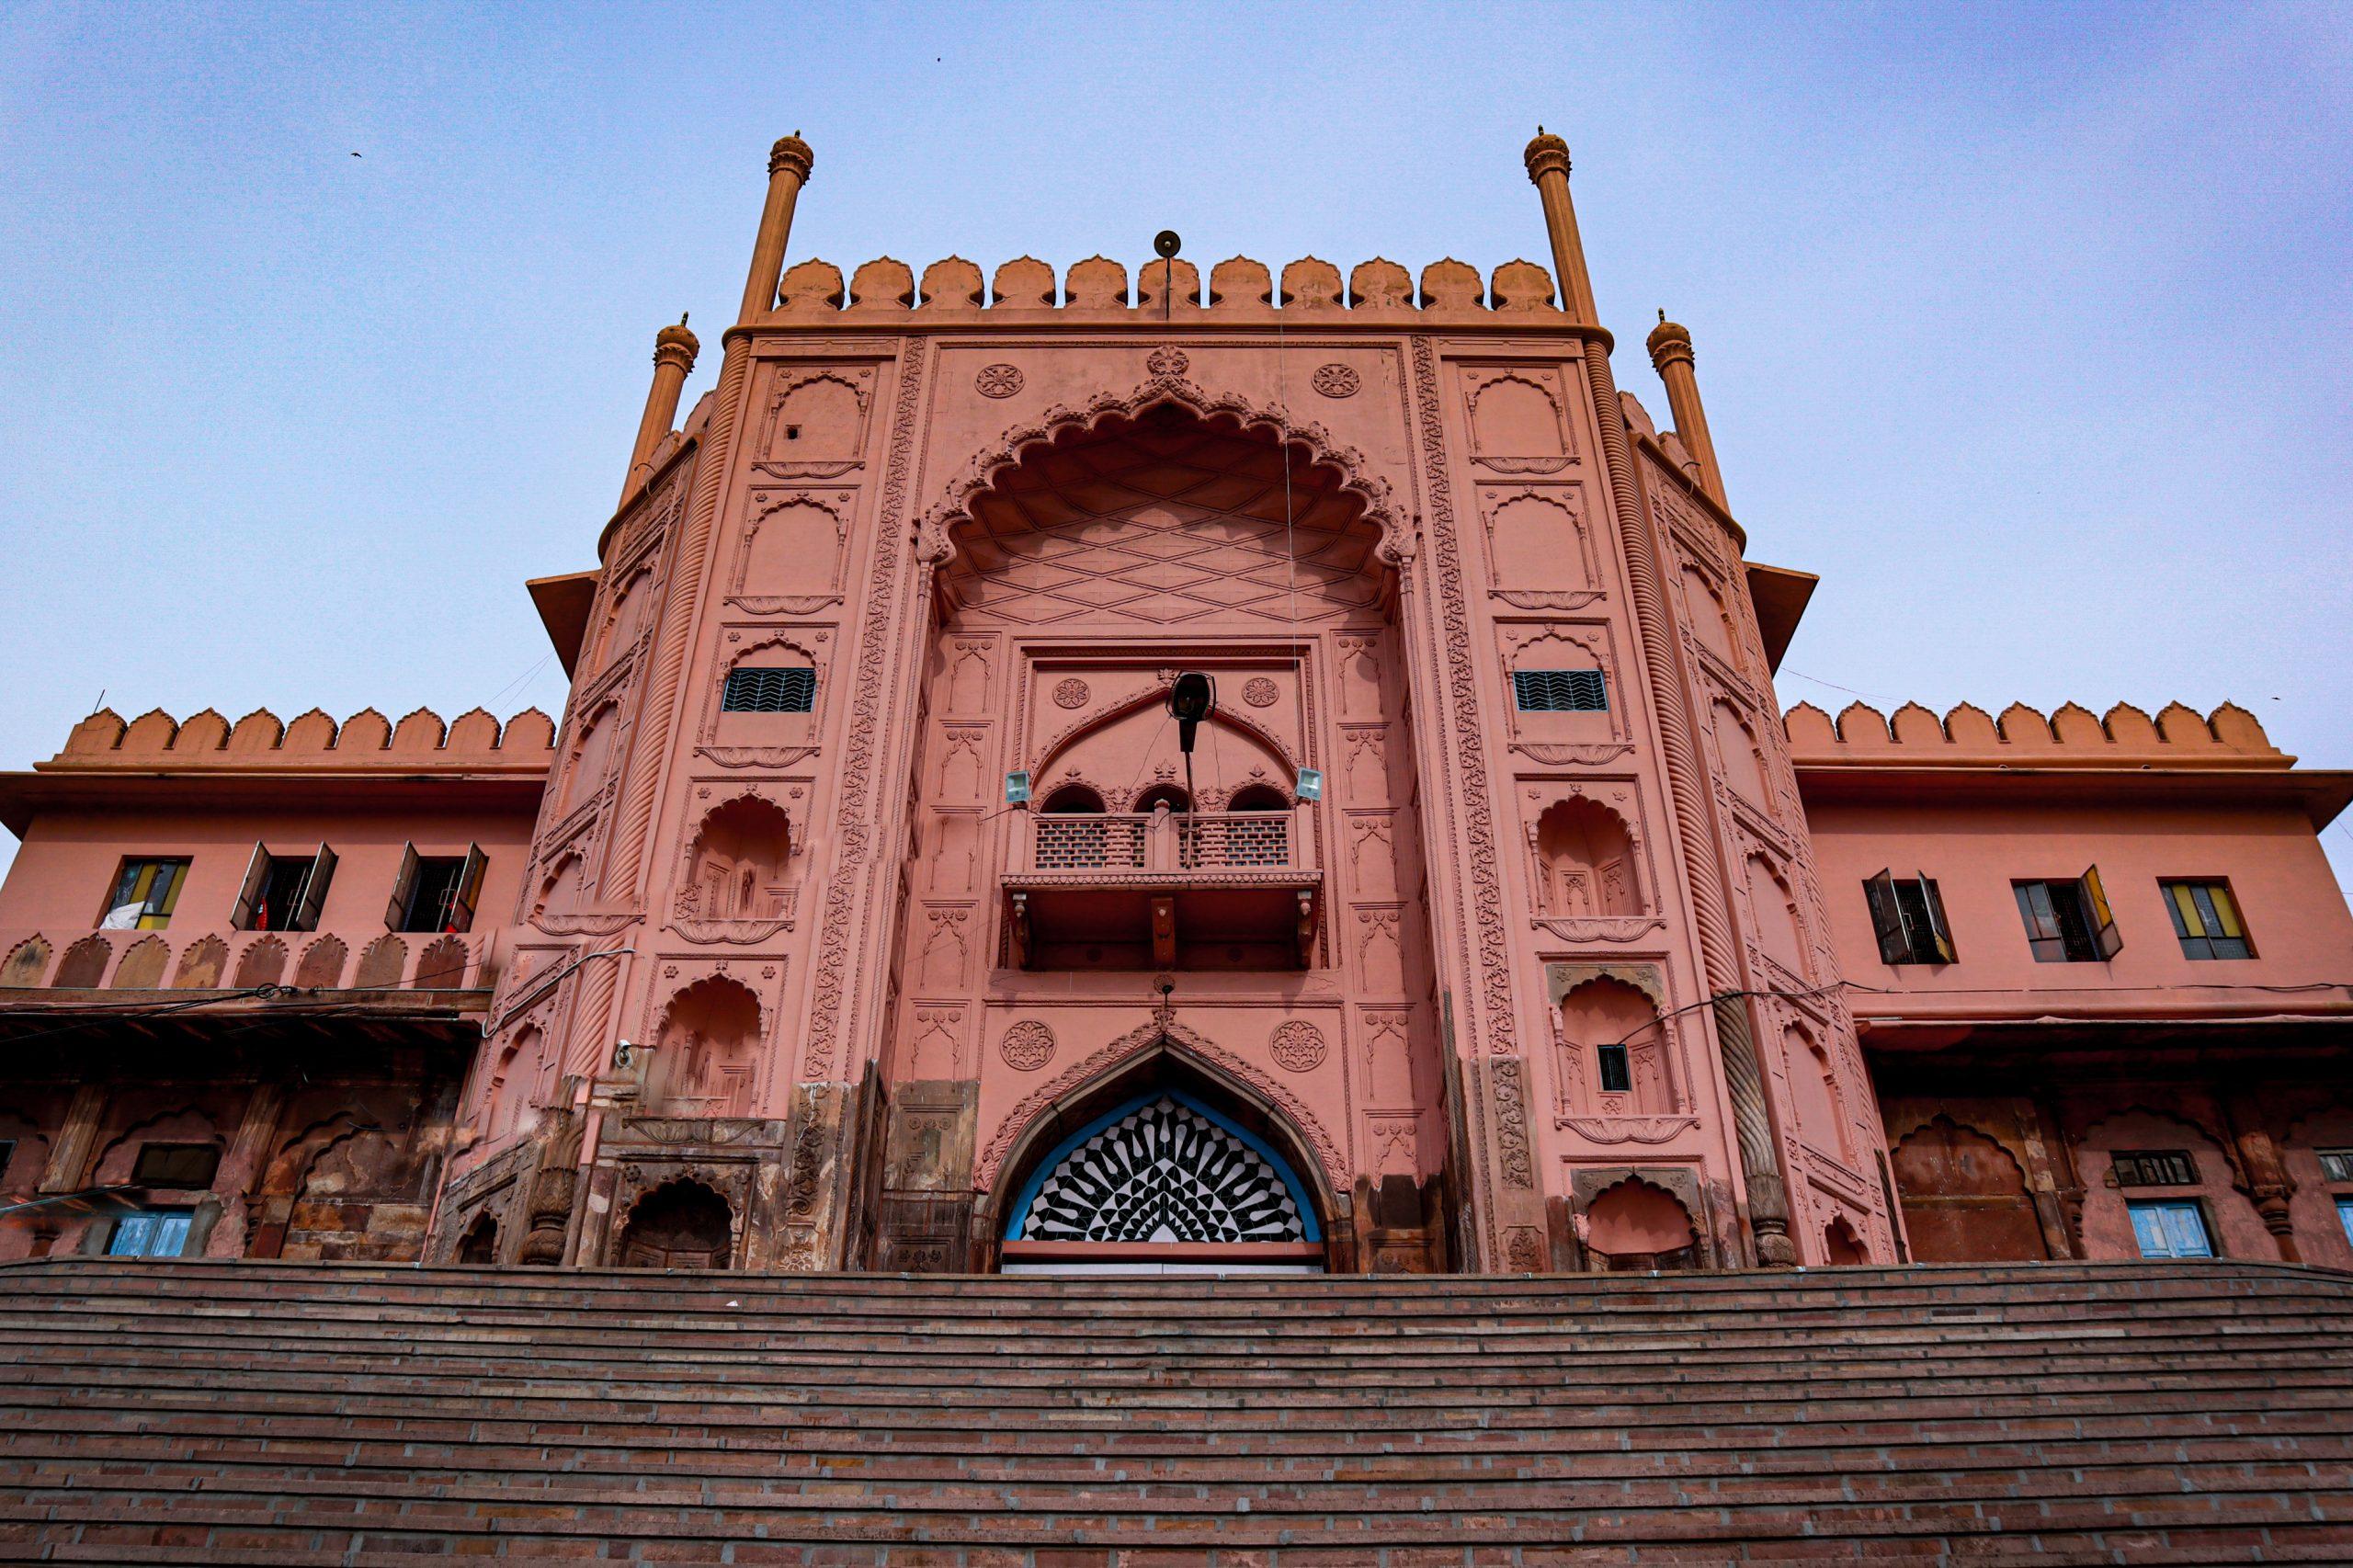 Tāj-ul-Masjid Facade